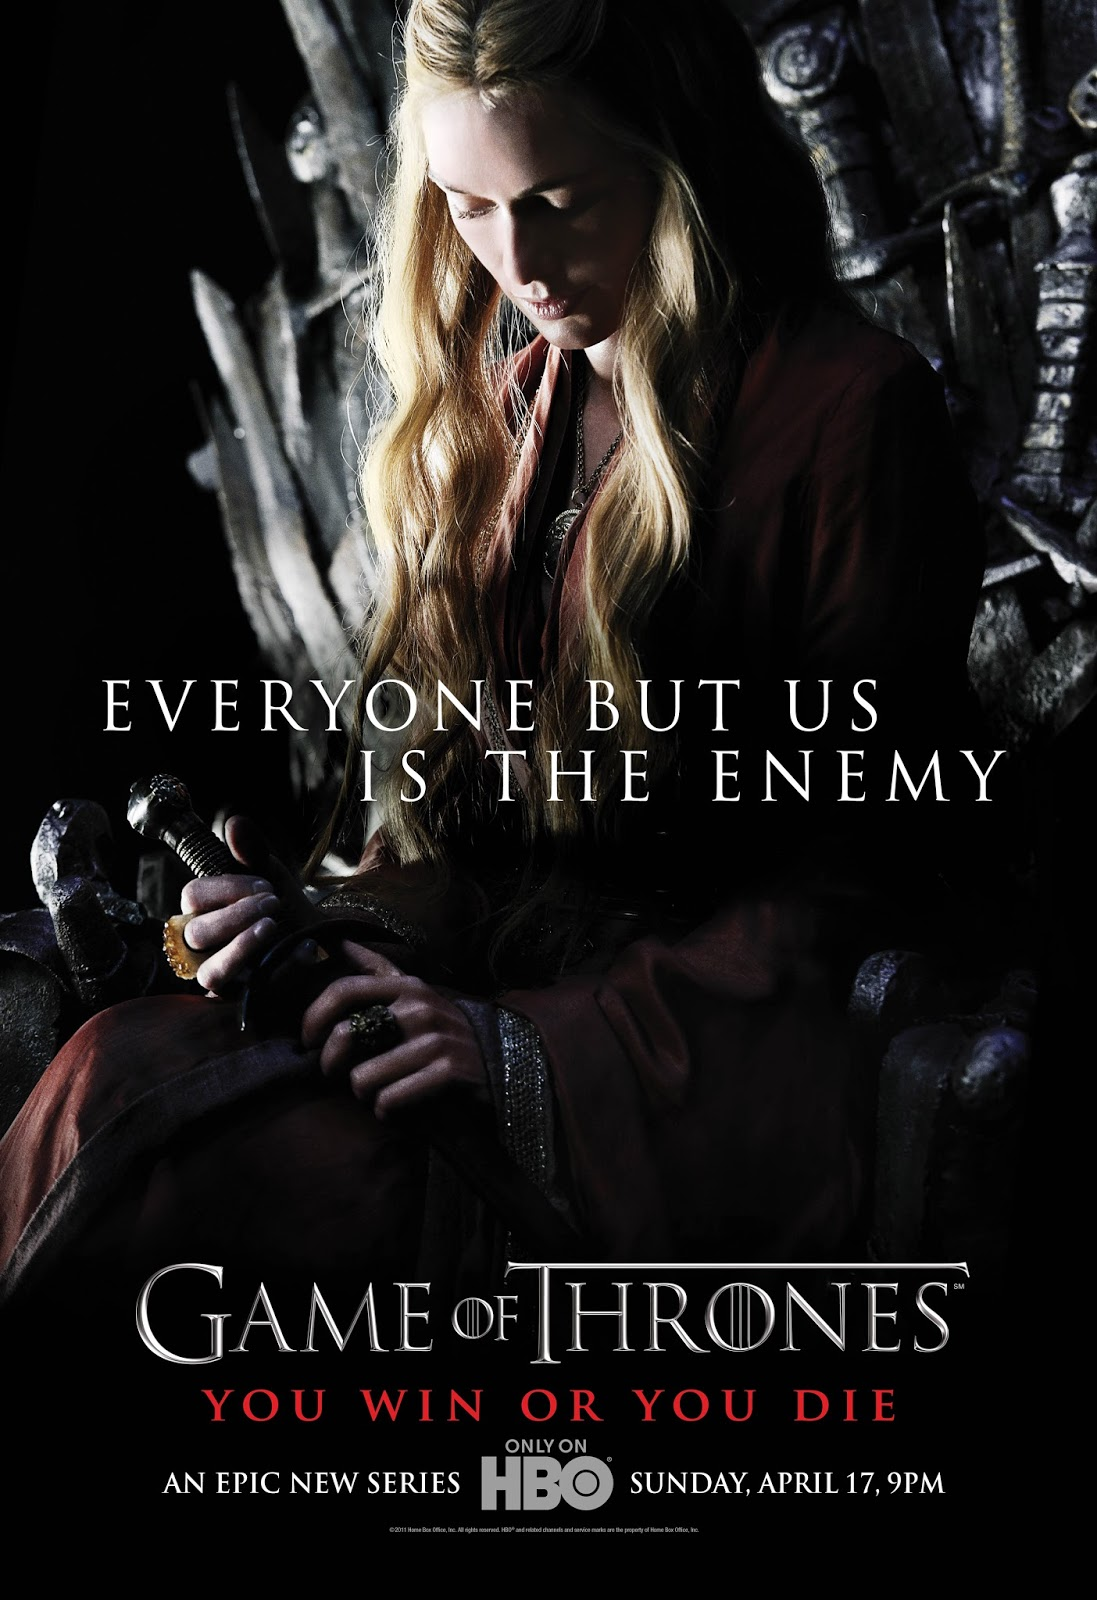 game of thrones season 1 guide